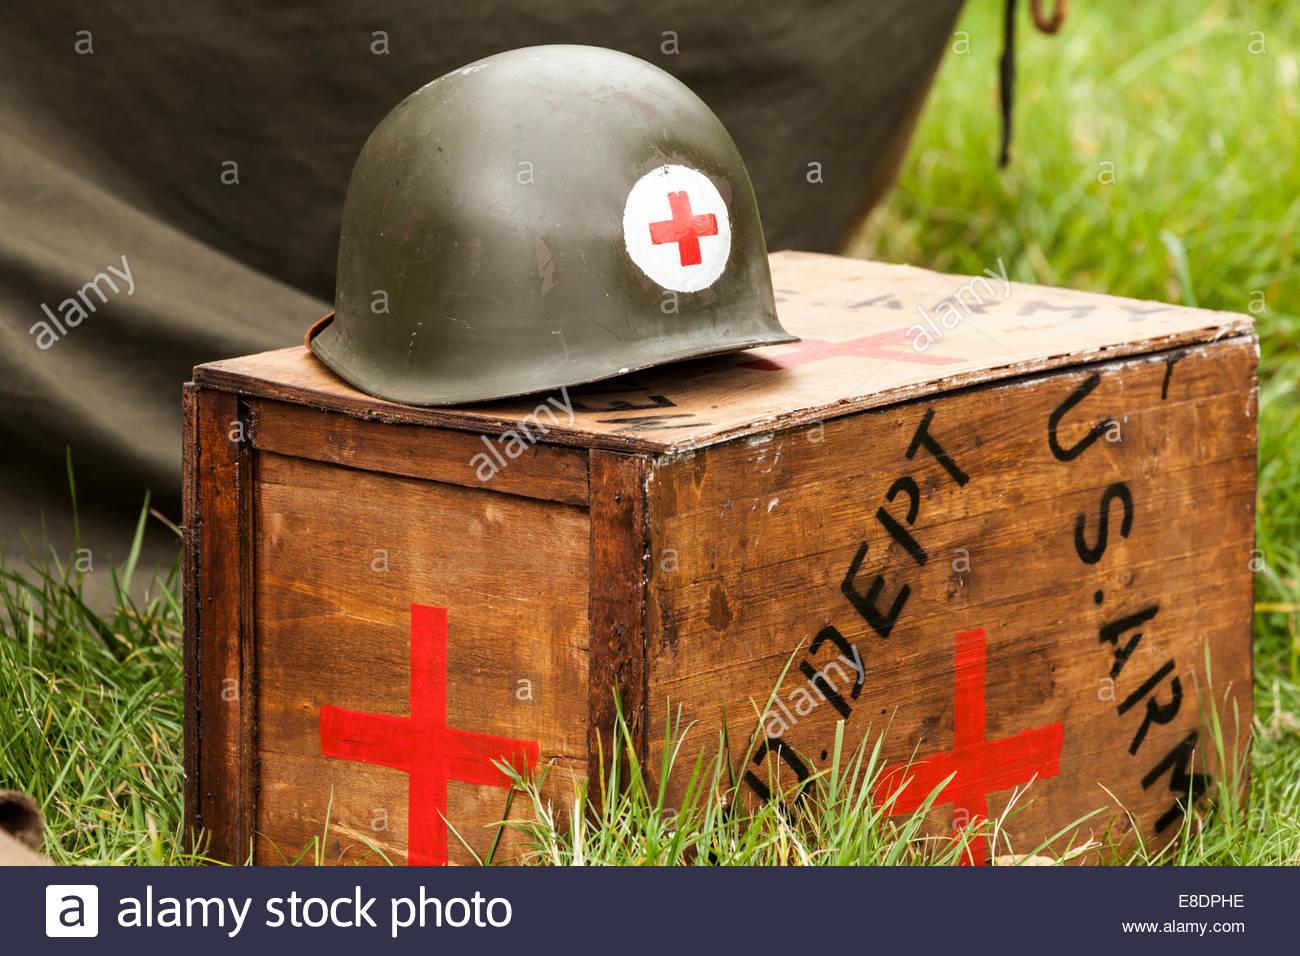 WW2 - US Army Medic Helmet and equipment box - Stock Image